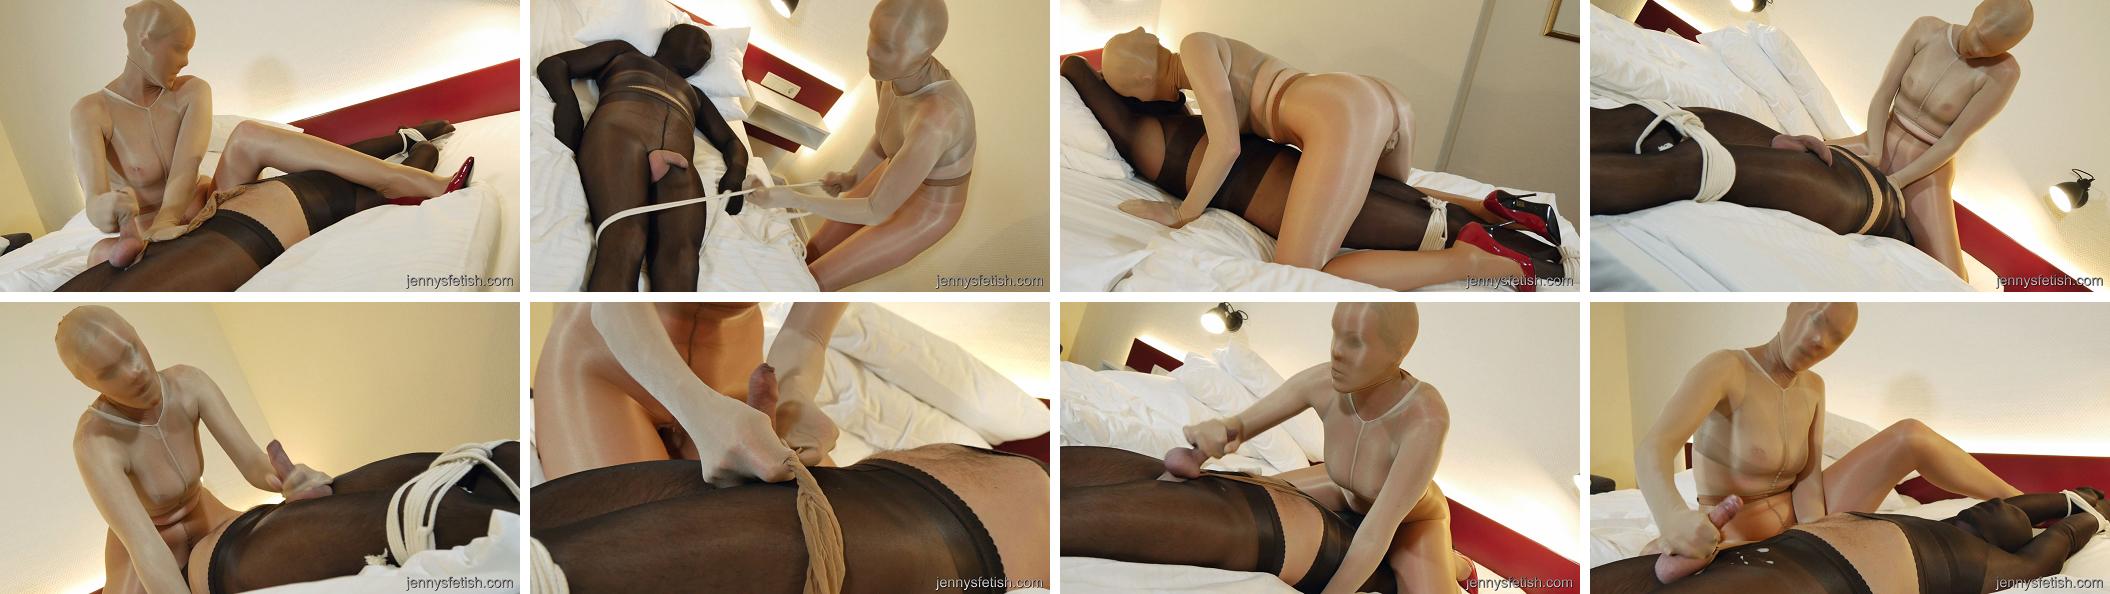 Collage pantyhose movies